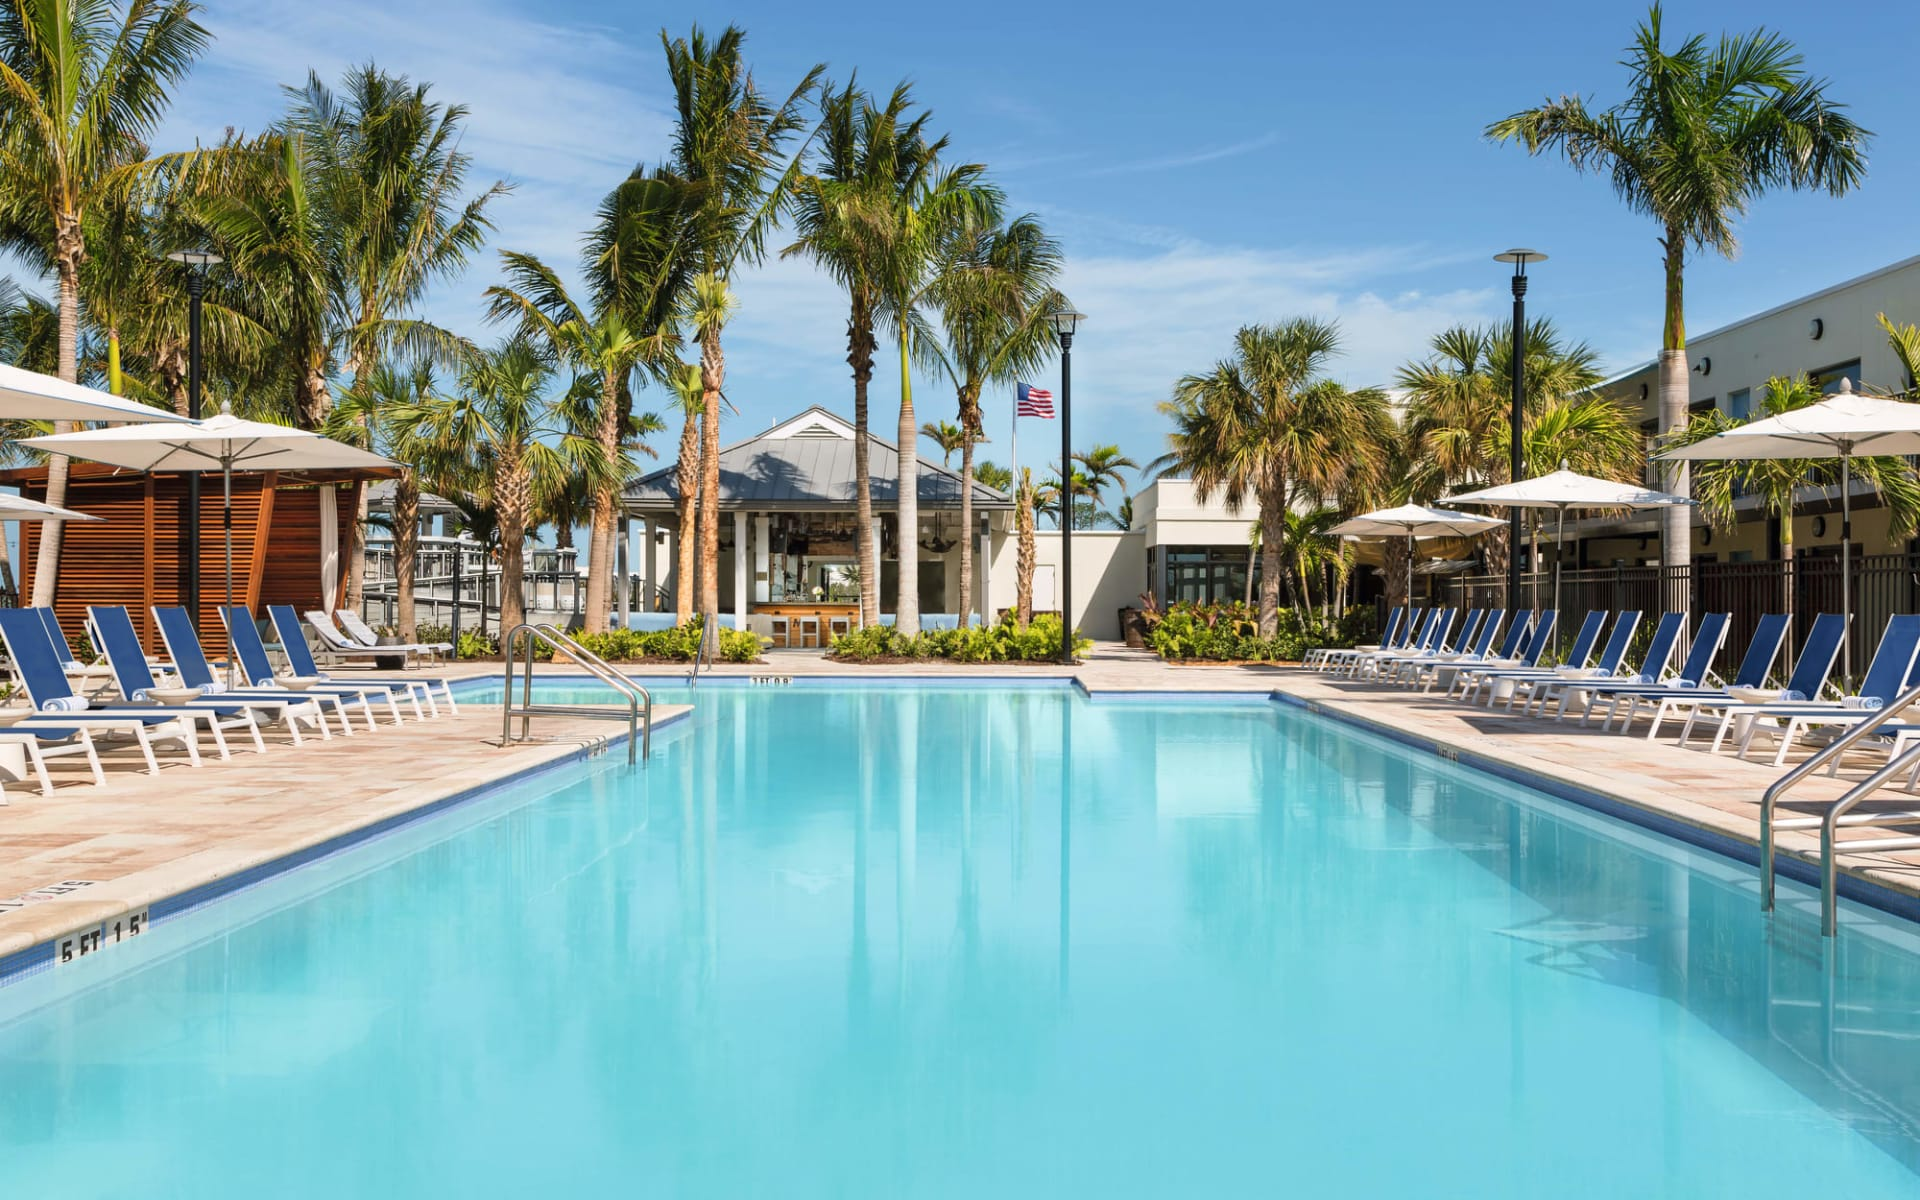 The Gates Hotel Key West:  The Gates_Pool